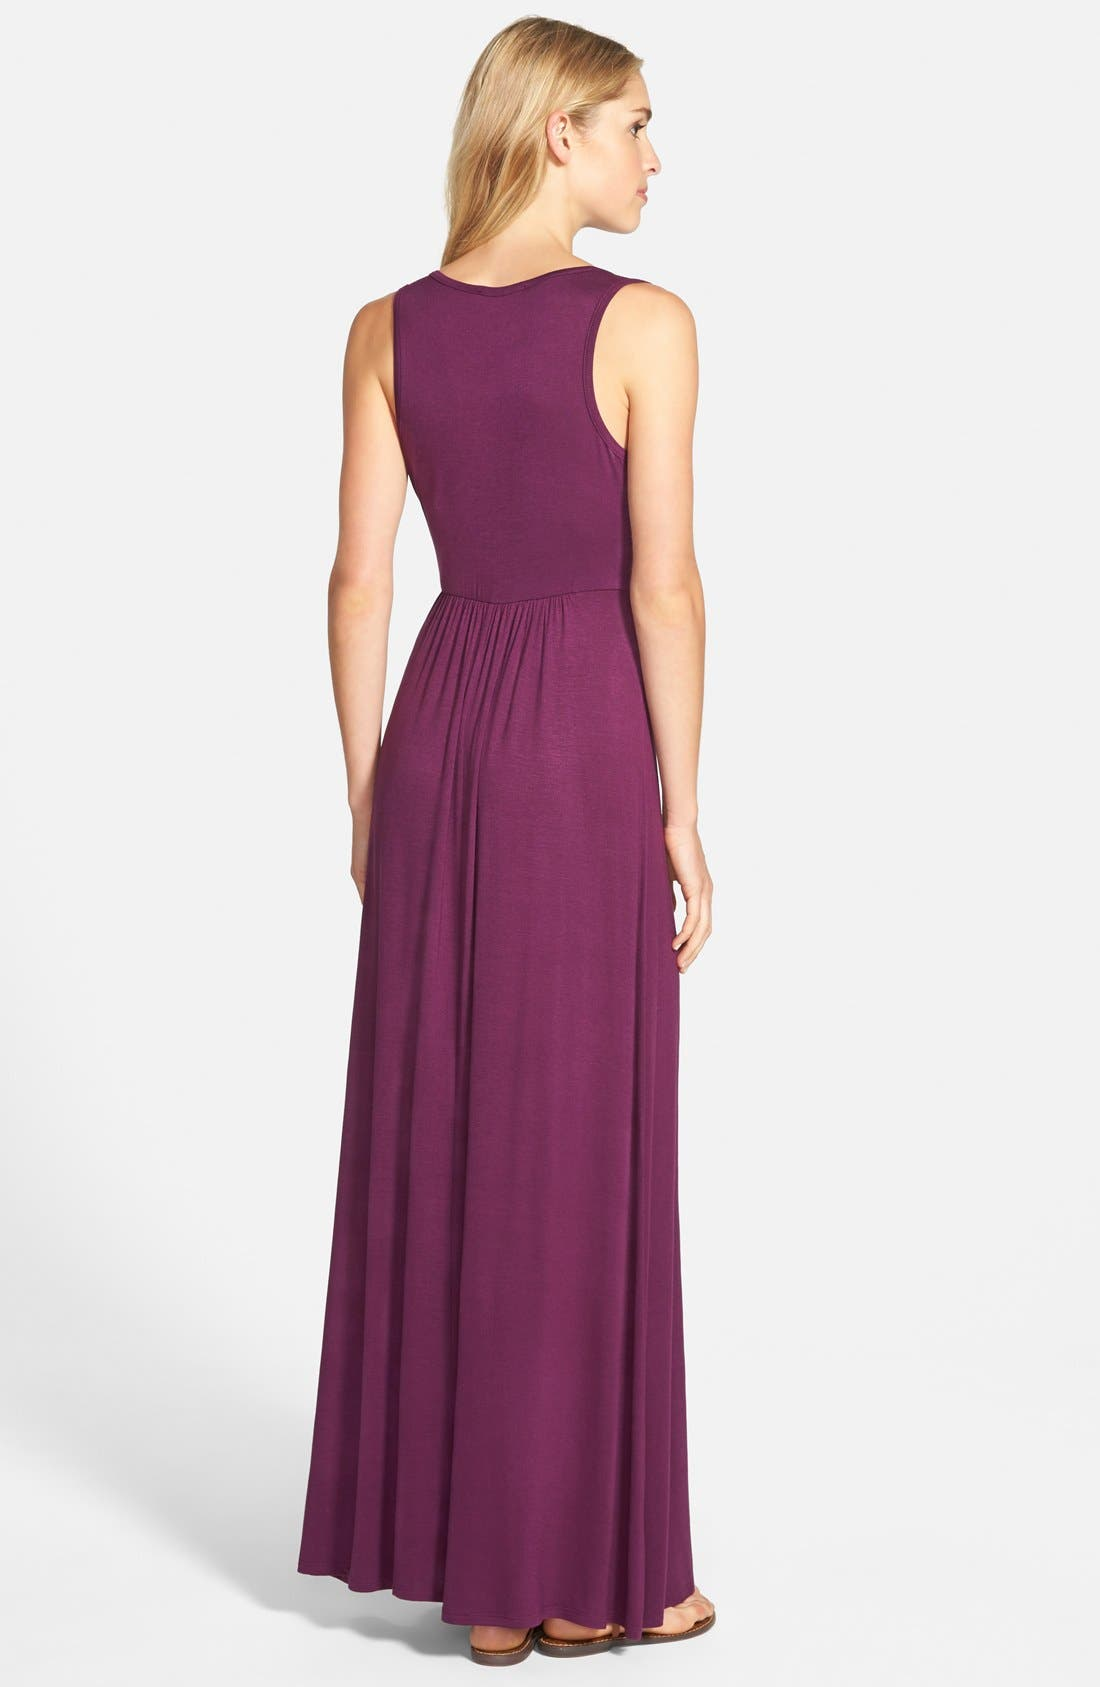 LOVEAPPELLA, V-Neck Jersey Maxi Dress, Alternate thumbnail 8, color, PURPLE DARK